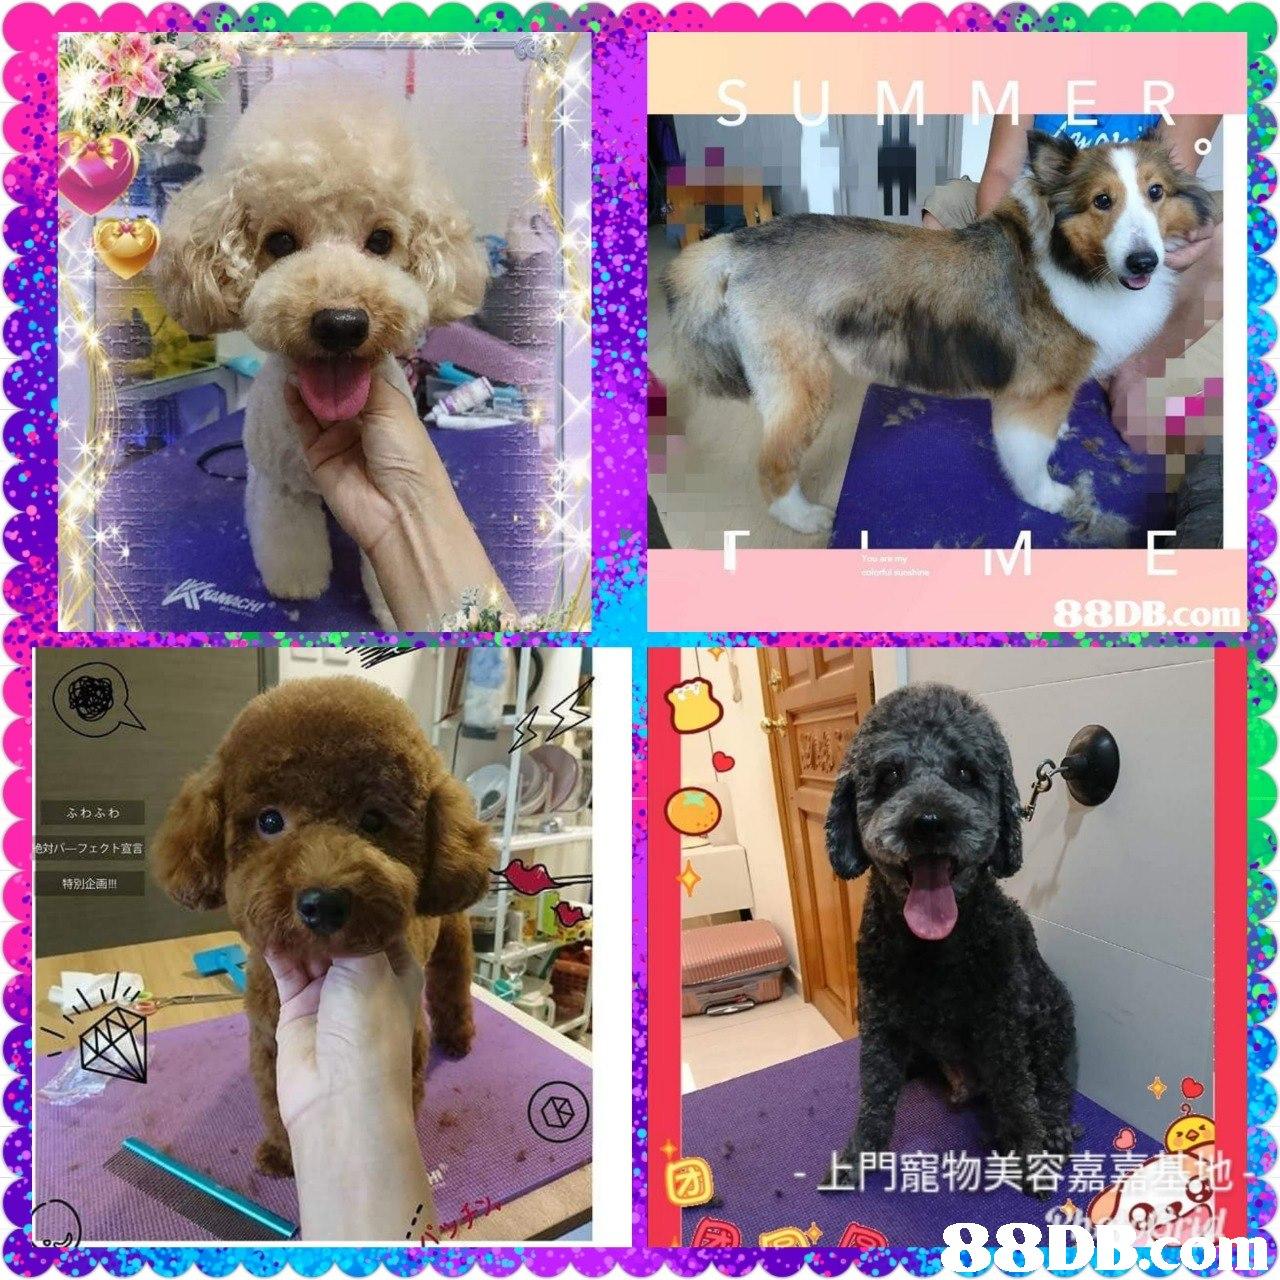 B.c ふわふわ パーフェクト宣言 特別企画!! -上門寵物美容嘉  dog,dog like mammal,dog breed,dog breed group,poodle